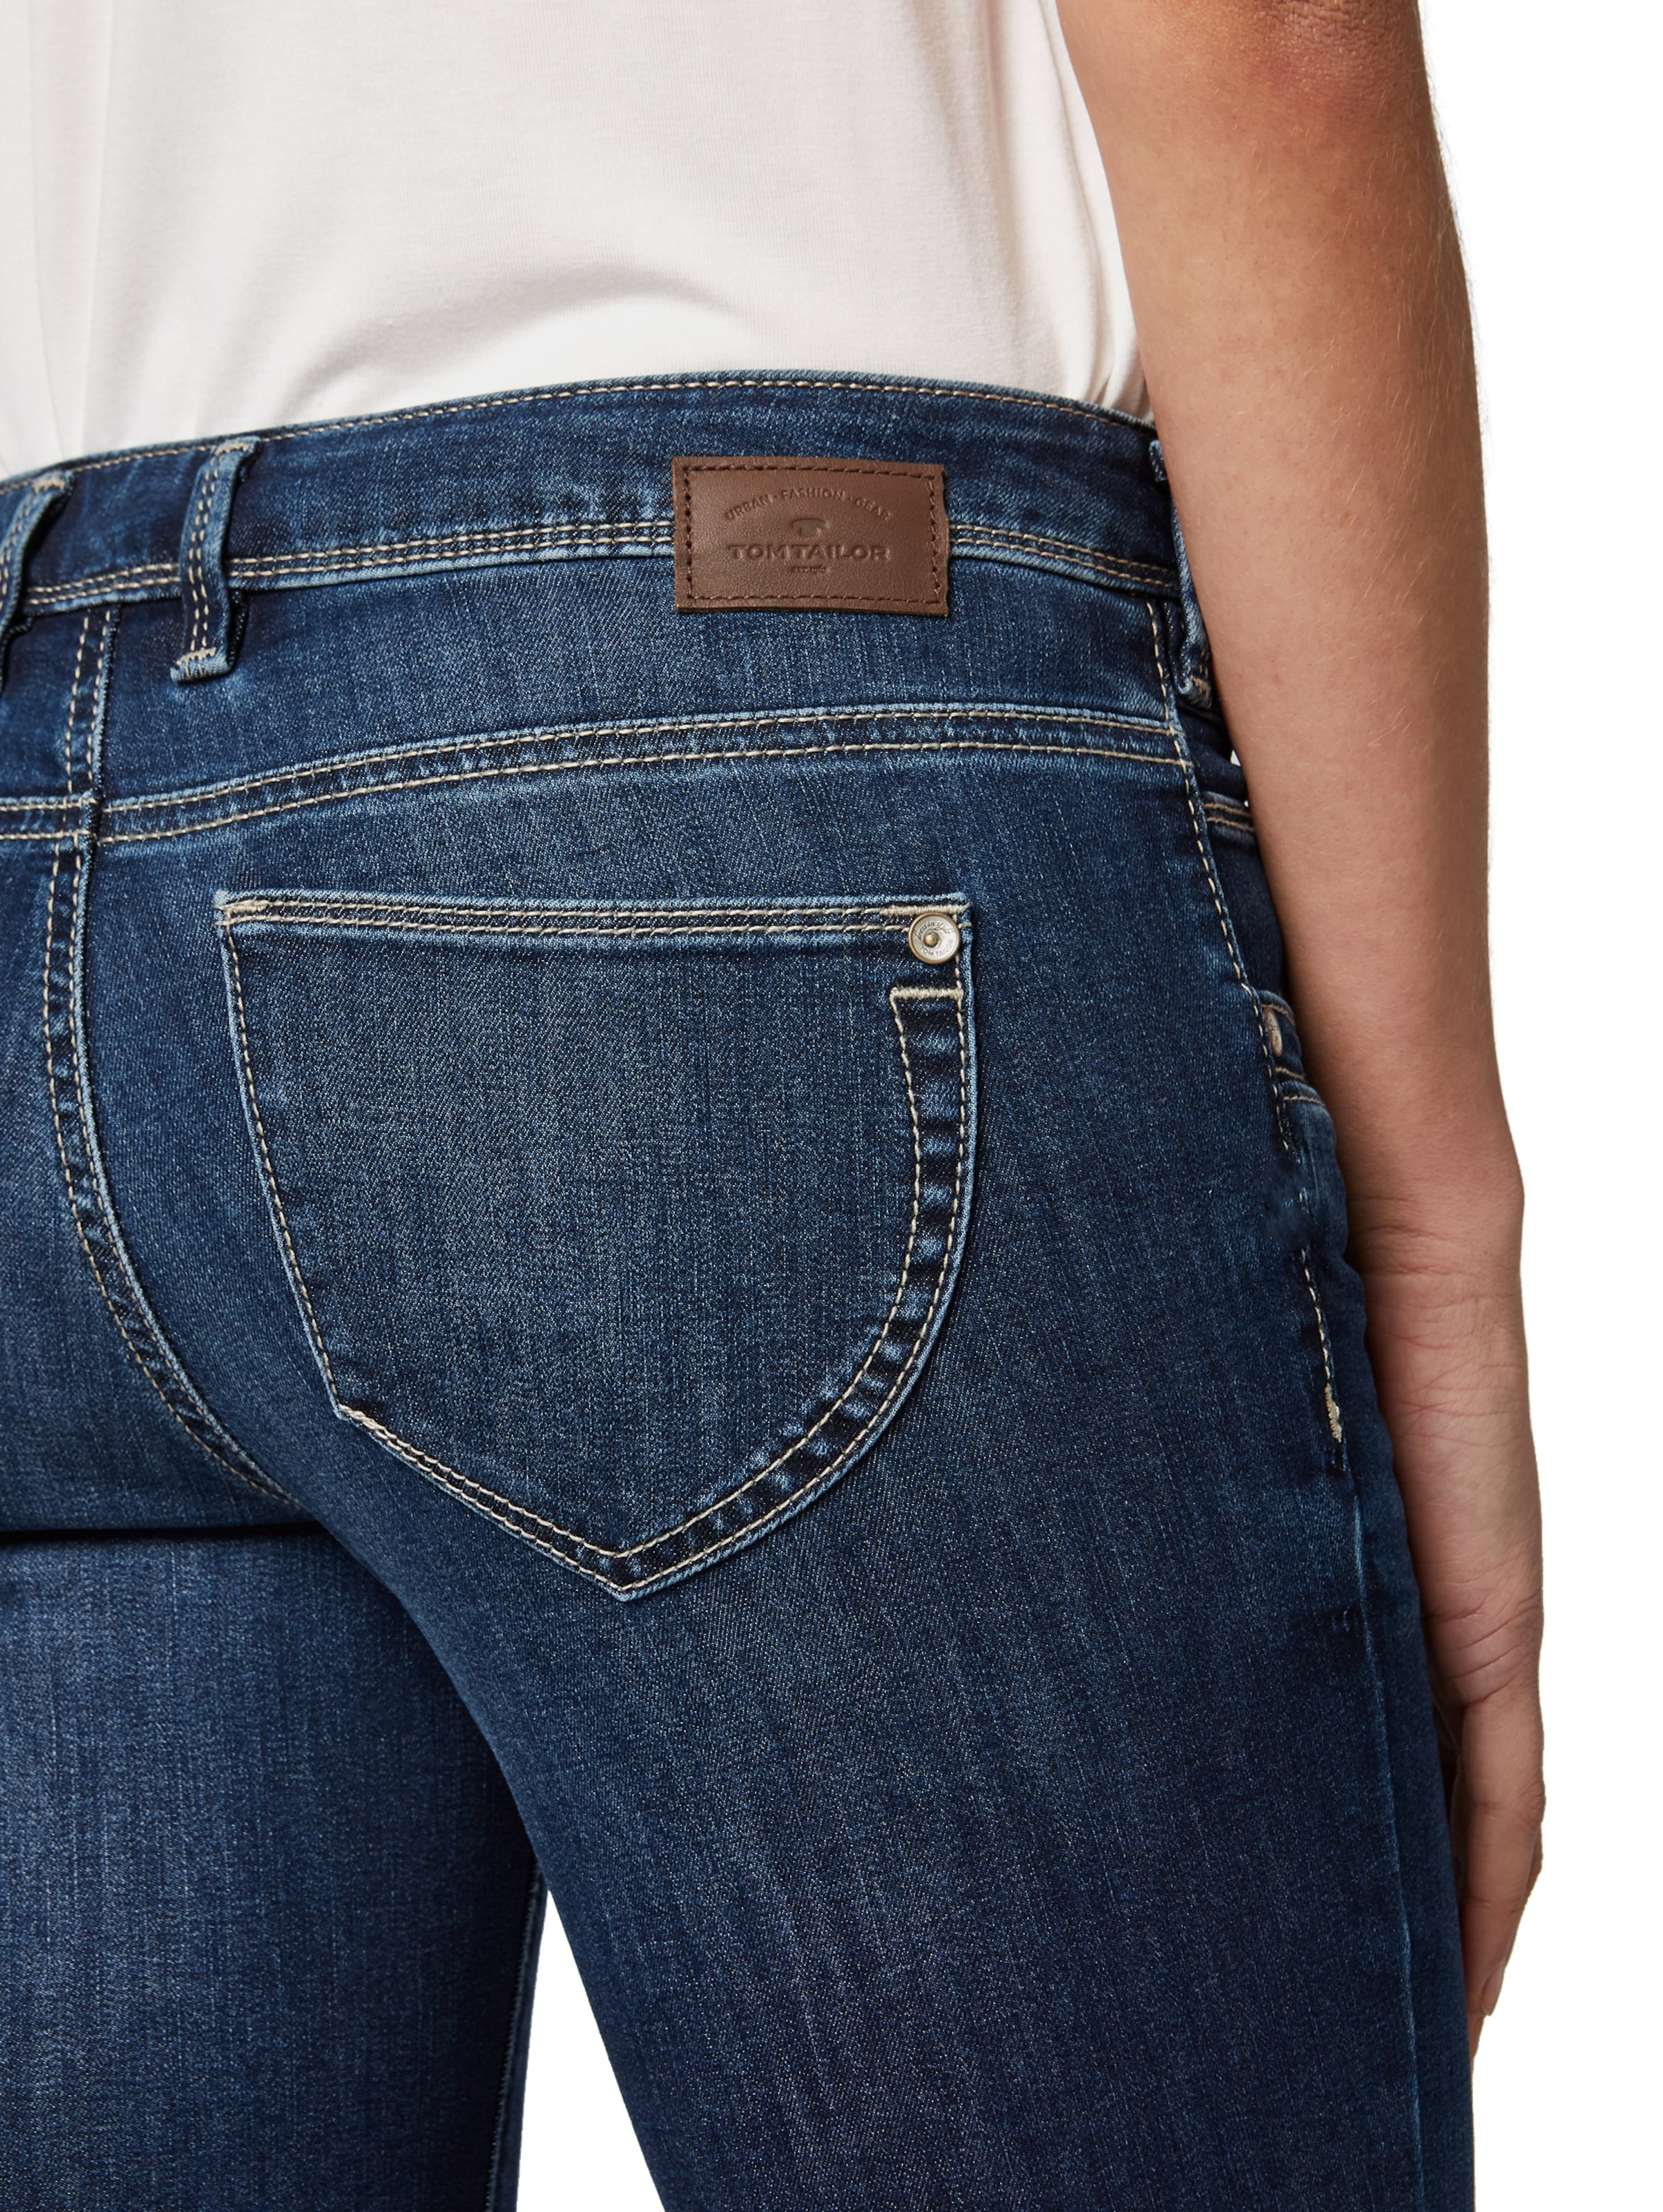 Jeans Tailor In Dunkelblau Tom 'alexa' 4jL35AqR